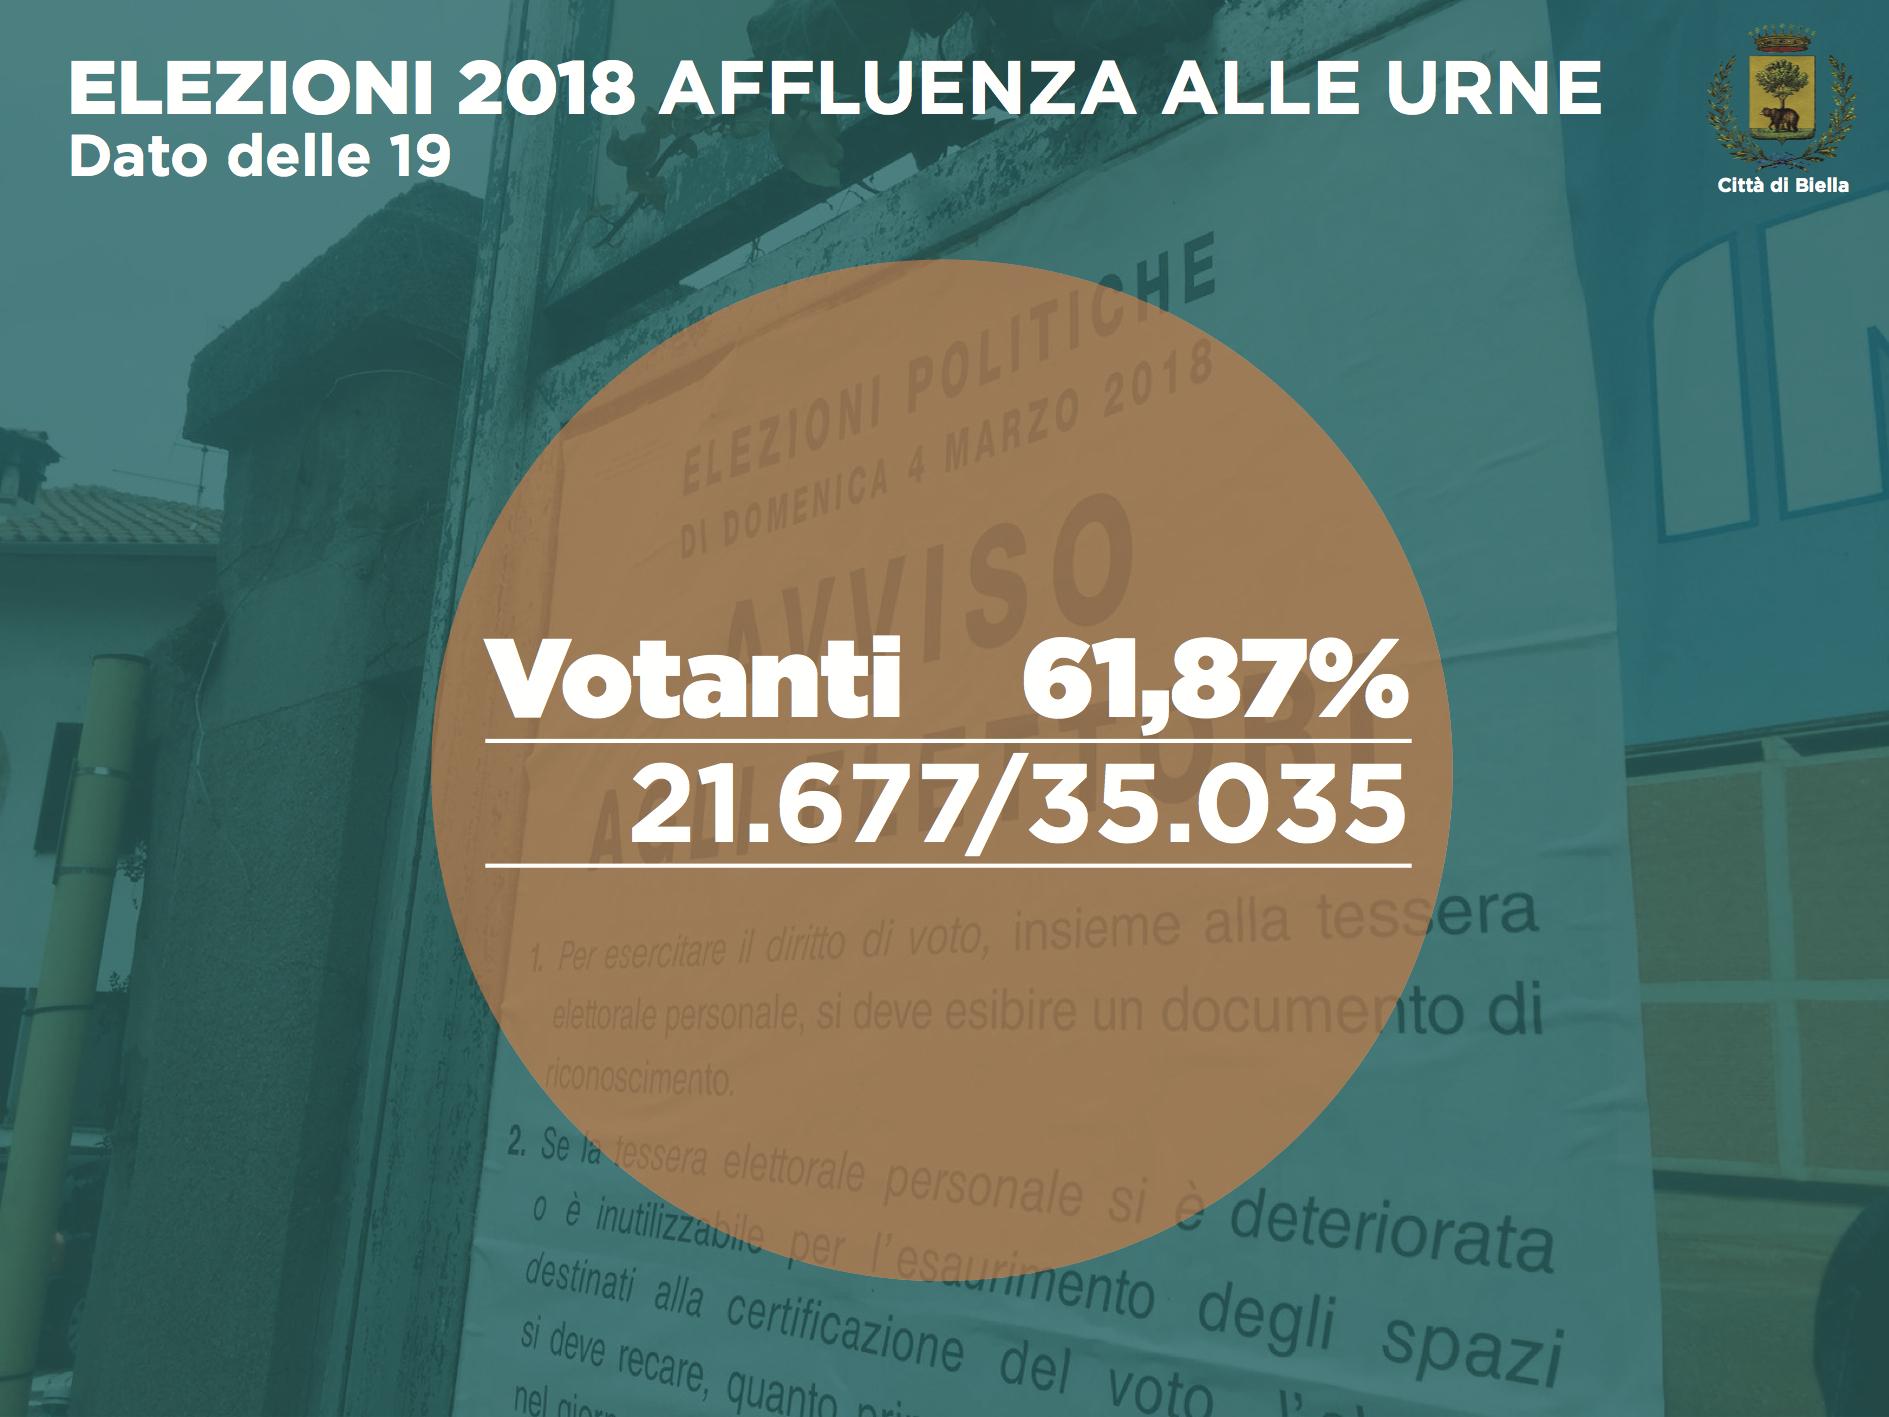 Elezioni 2018: l'affluenza alle 19